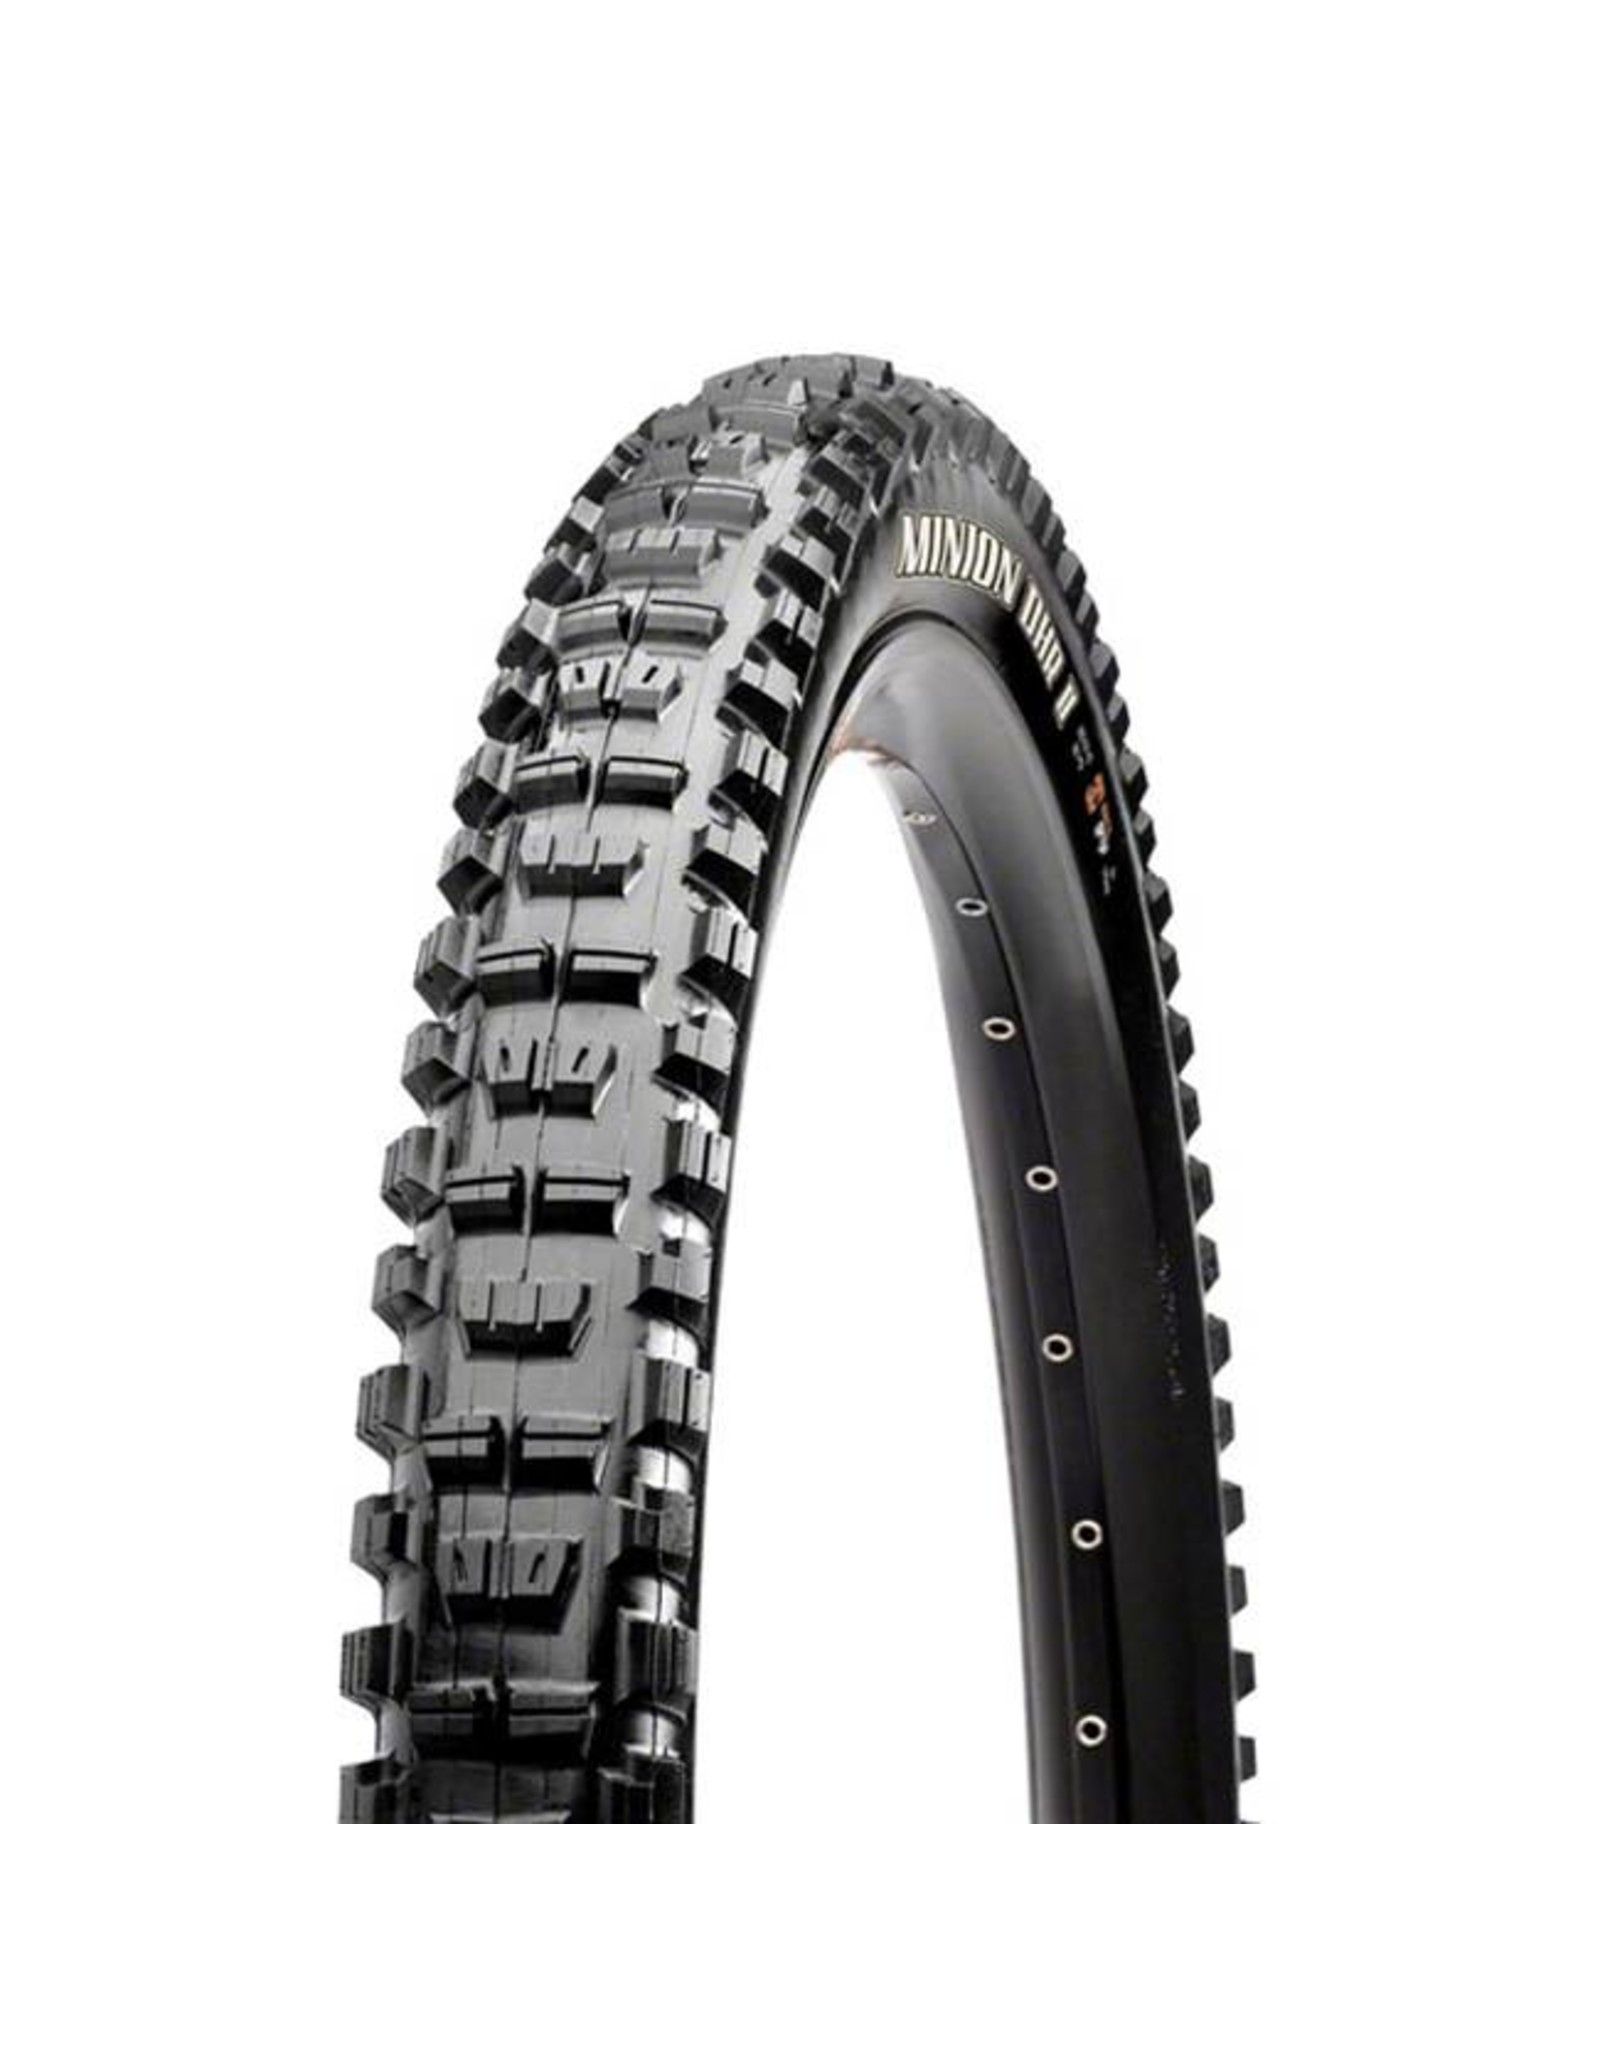 "Maxxis Maxxis Minion DHR II Tire: 27.5 x 2.40"", Wire, 60tpi, 3C 2-Ply, Black"